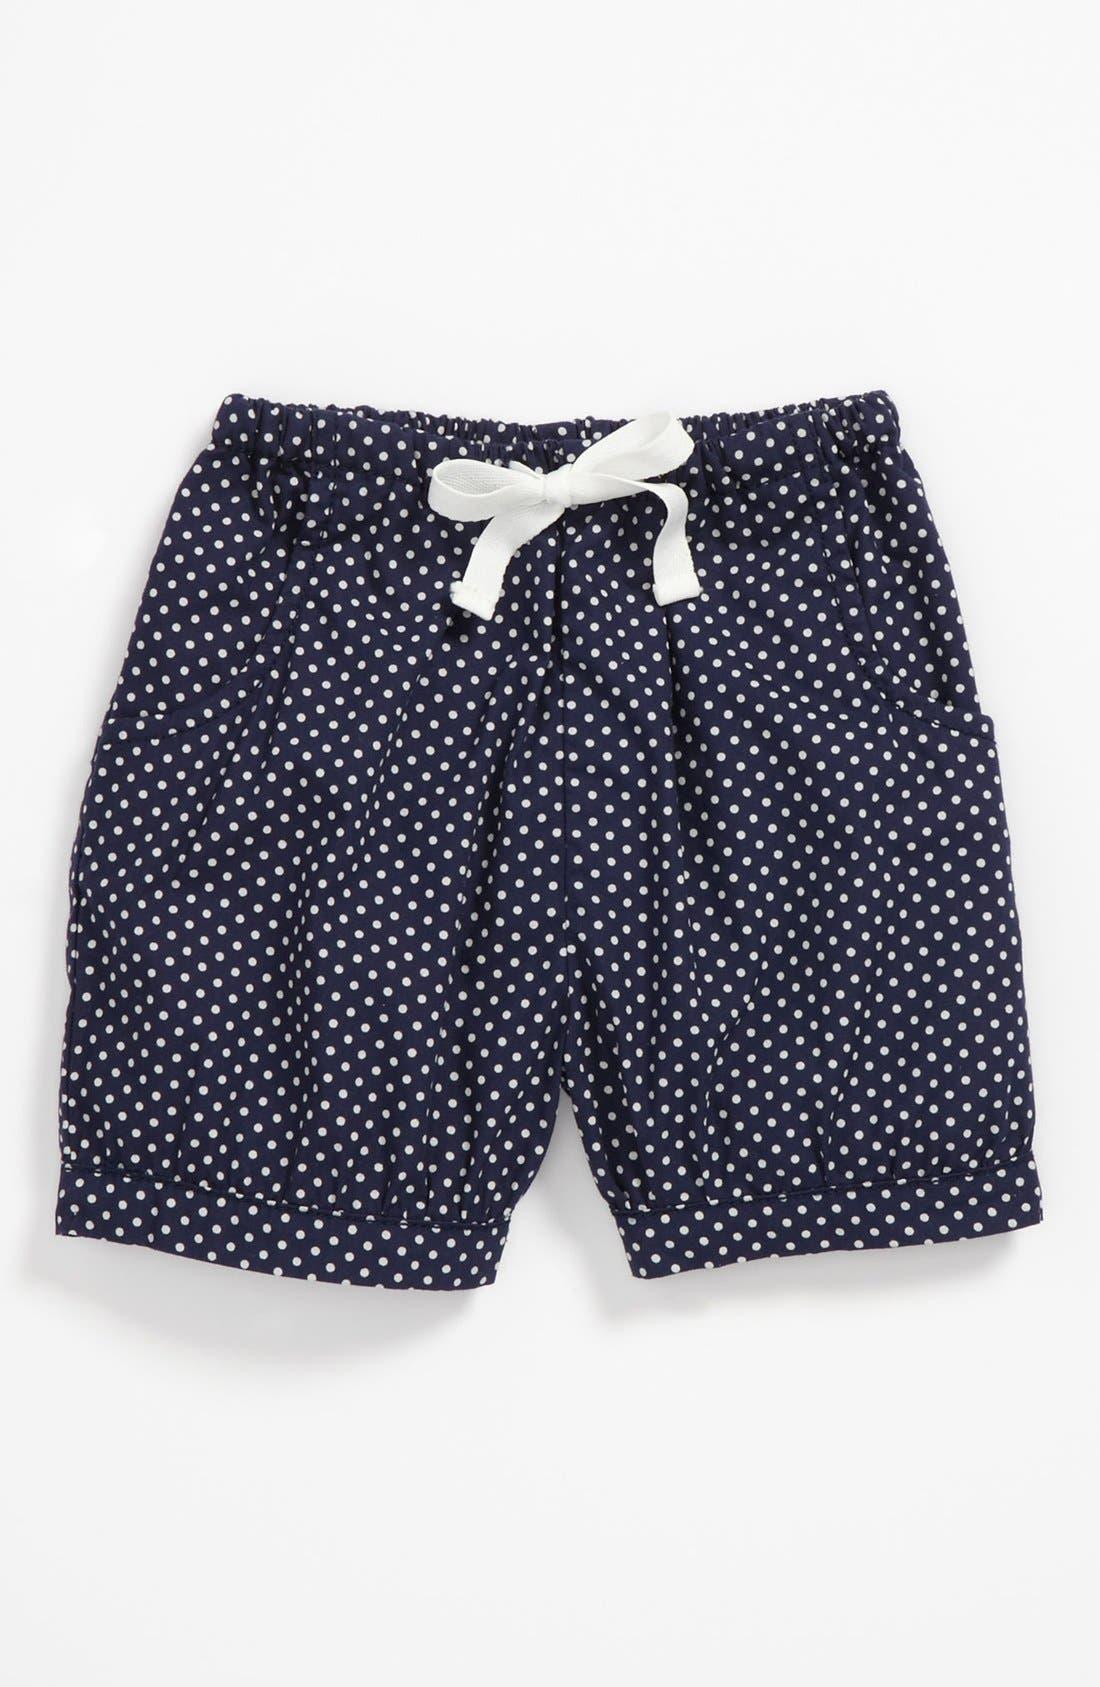 Alternate Image 1 Selected - Tucker + Tate 'Kara' Print Bubble Shorts (Toddler)